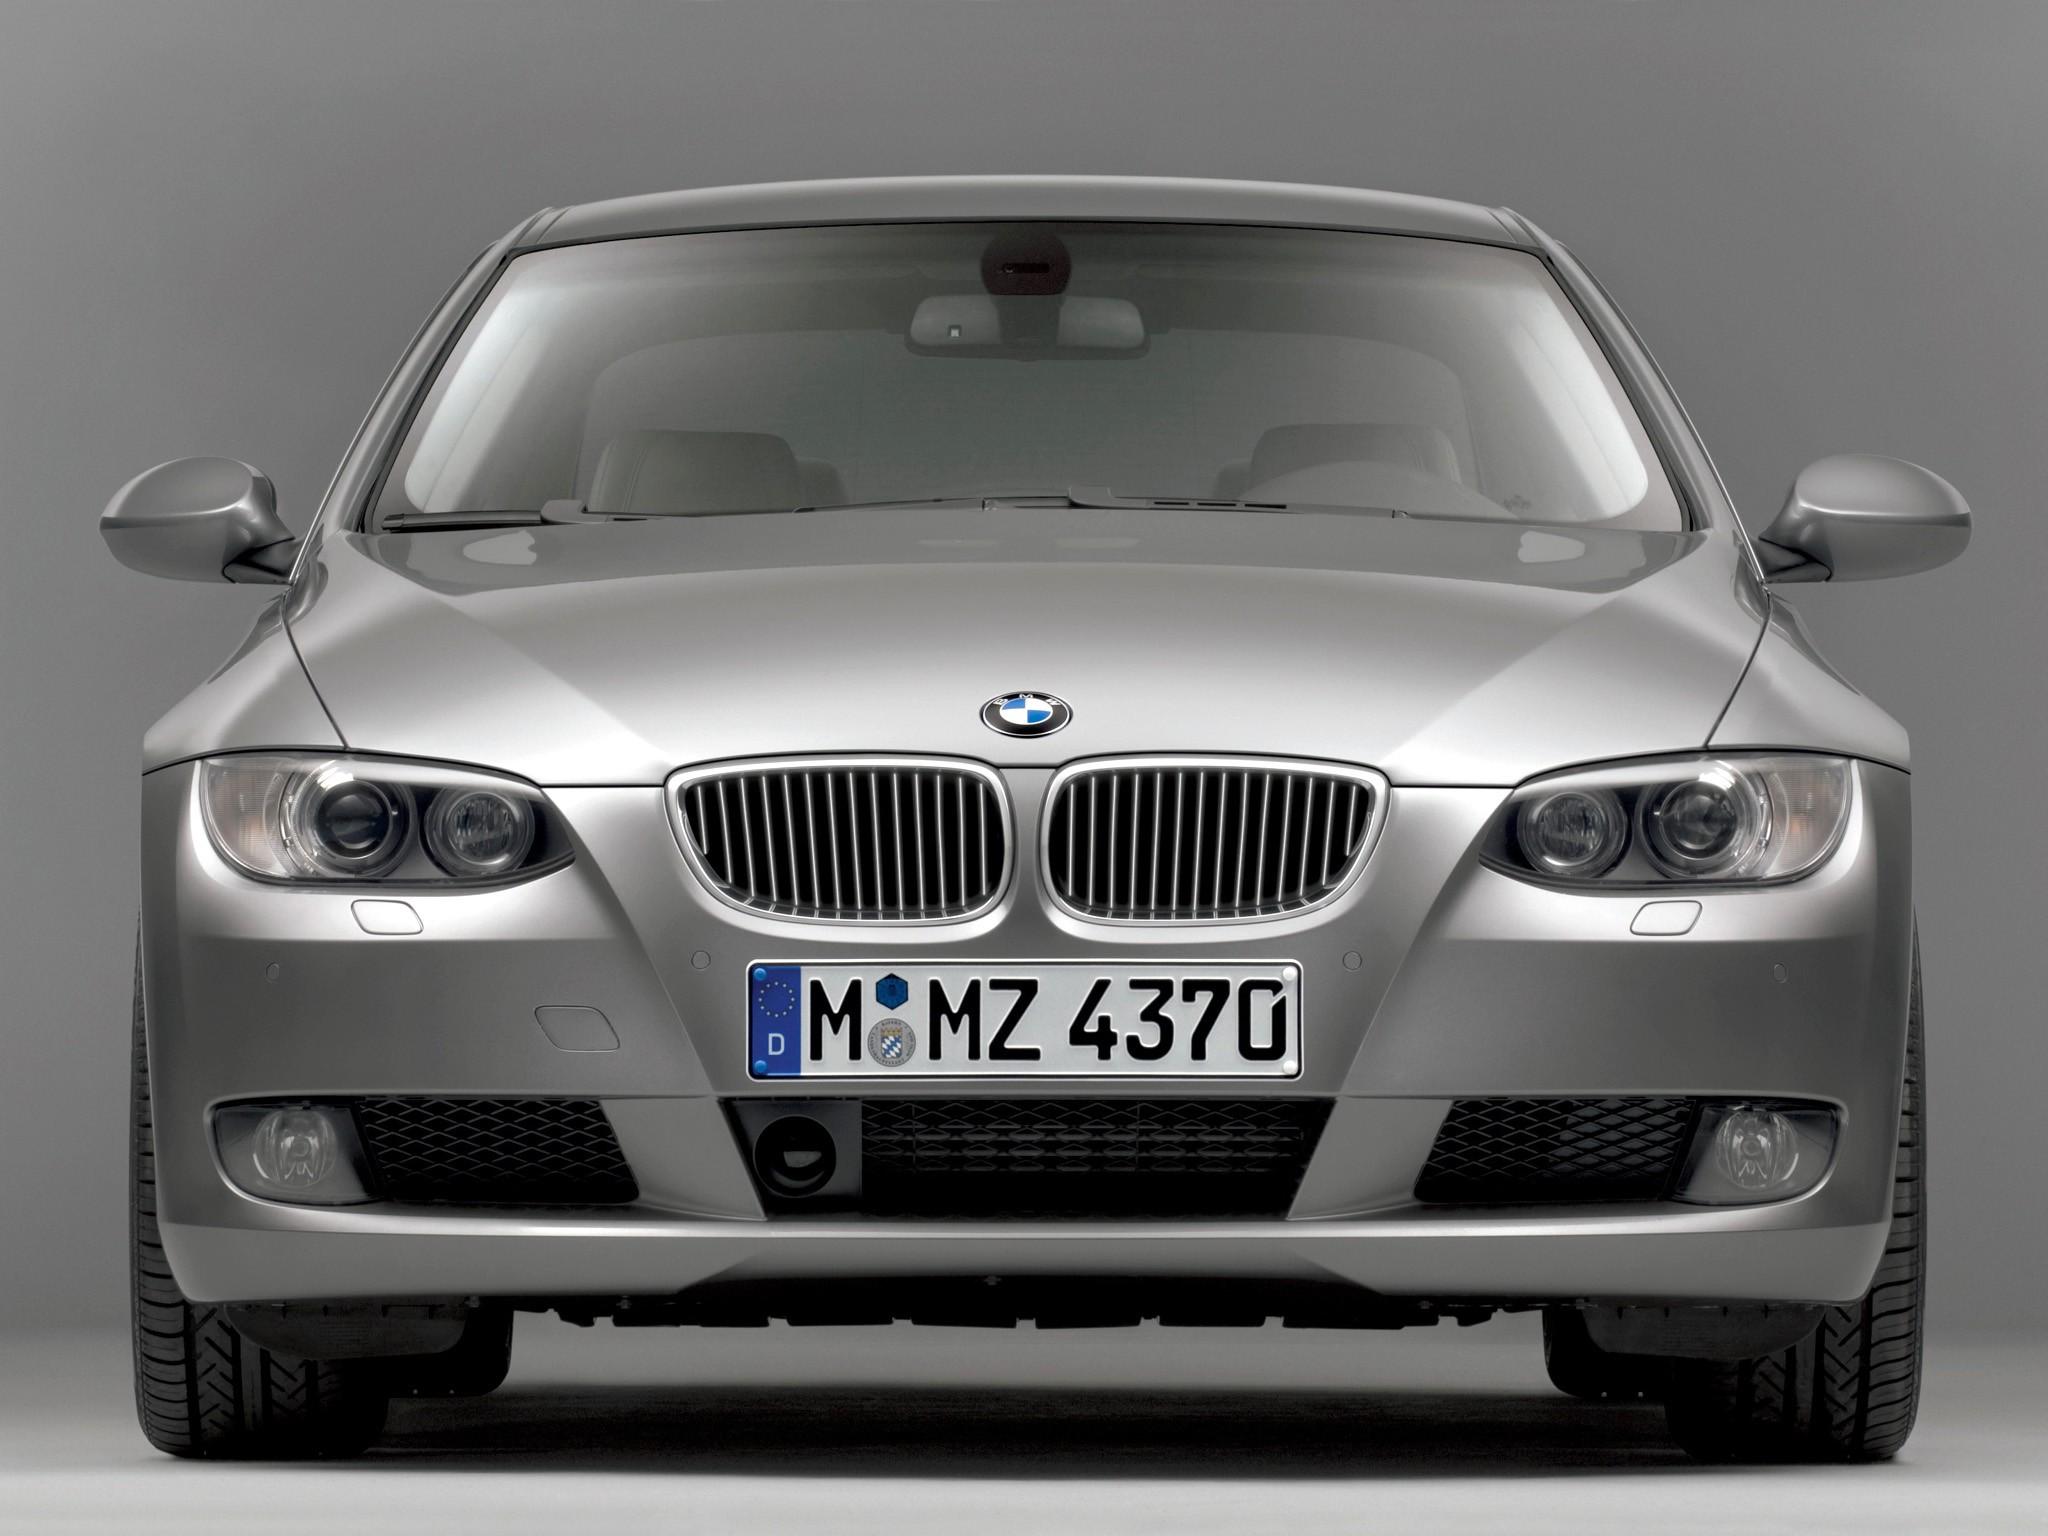 bmw coupe 335i e92 2007 series e90 330i xdrive 2006 m3 e93 2009 preview e91 325i 328i space front autoevolution